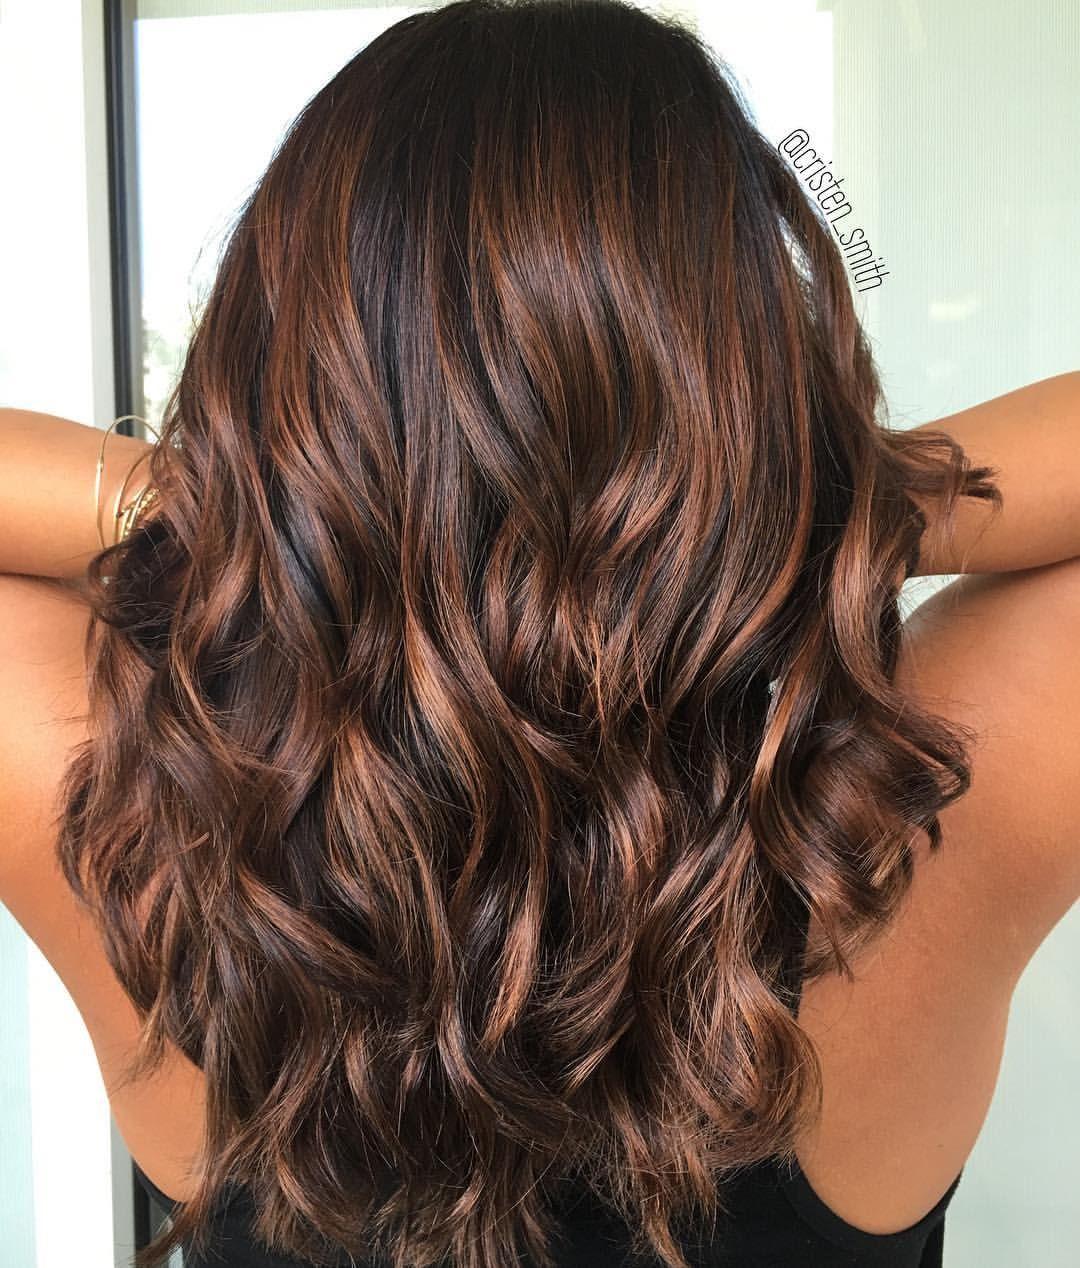 Hairstylist Colorist Fave4 style expert Serene salon